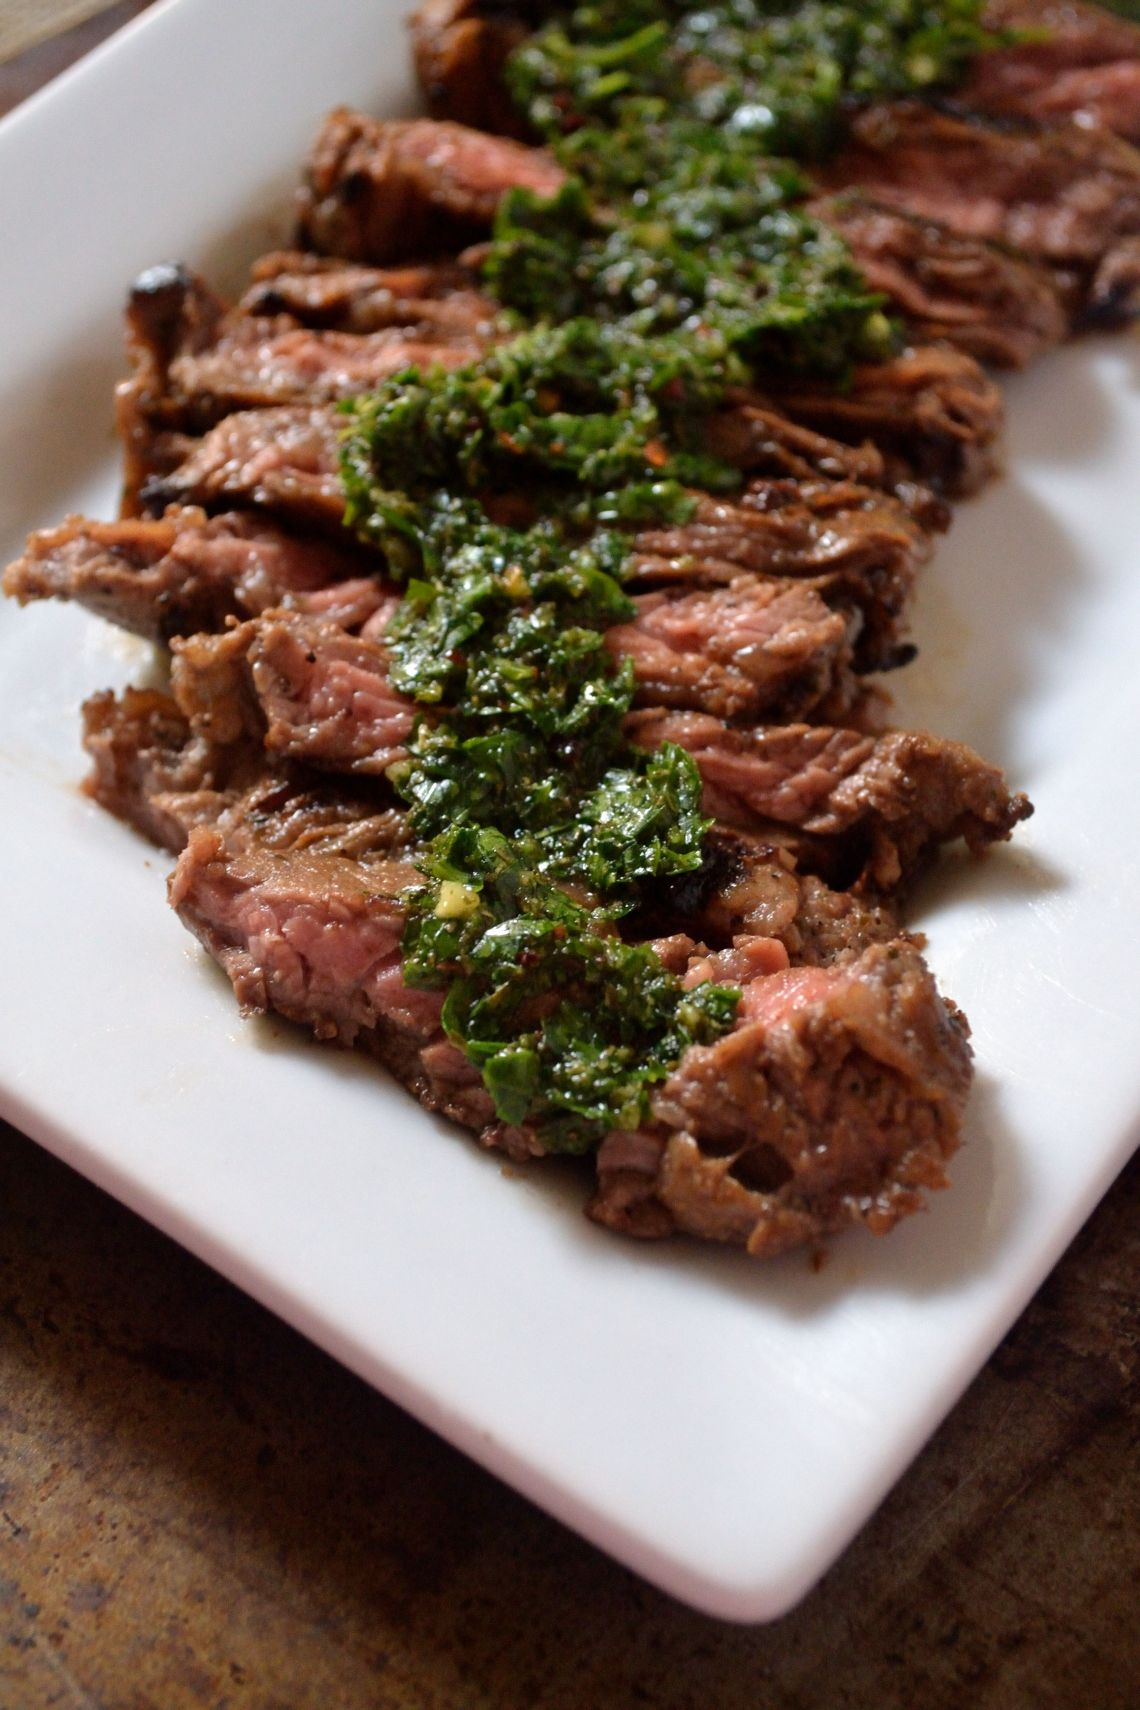 Marinaded Skirt Steak and Chimichurri Sauce